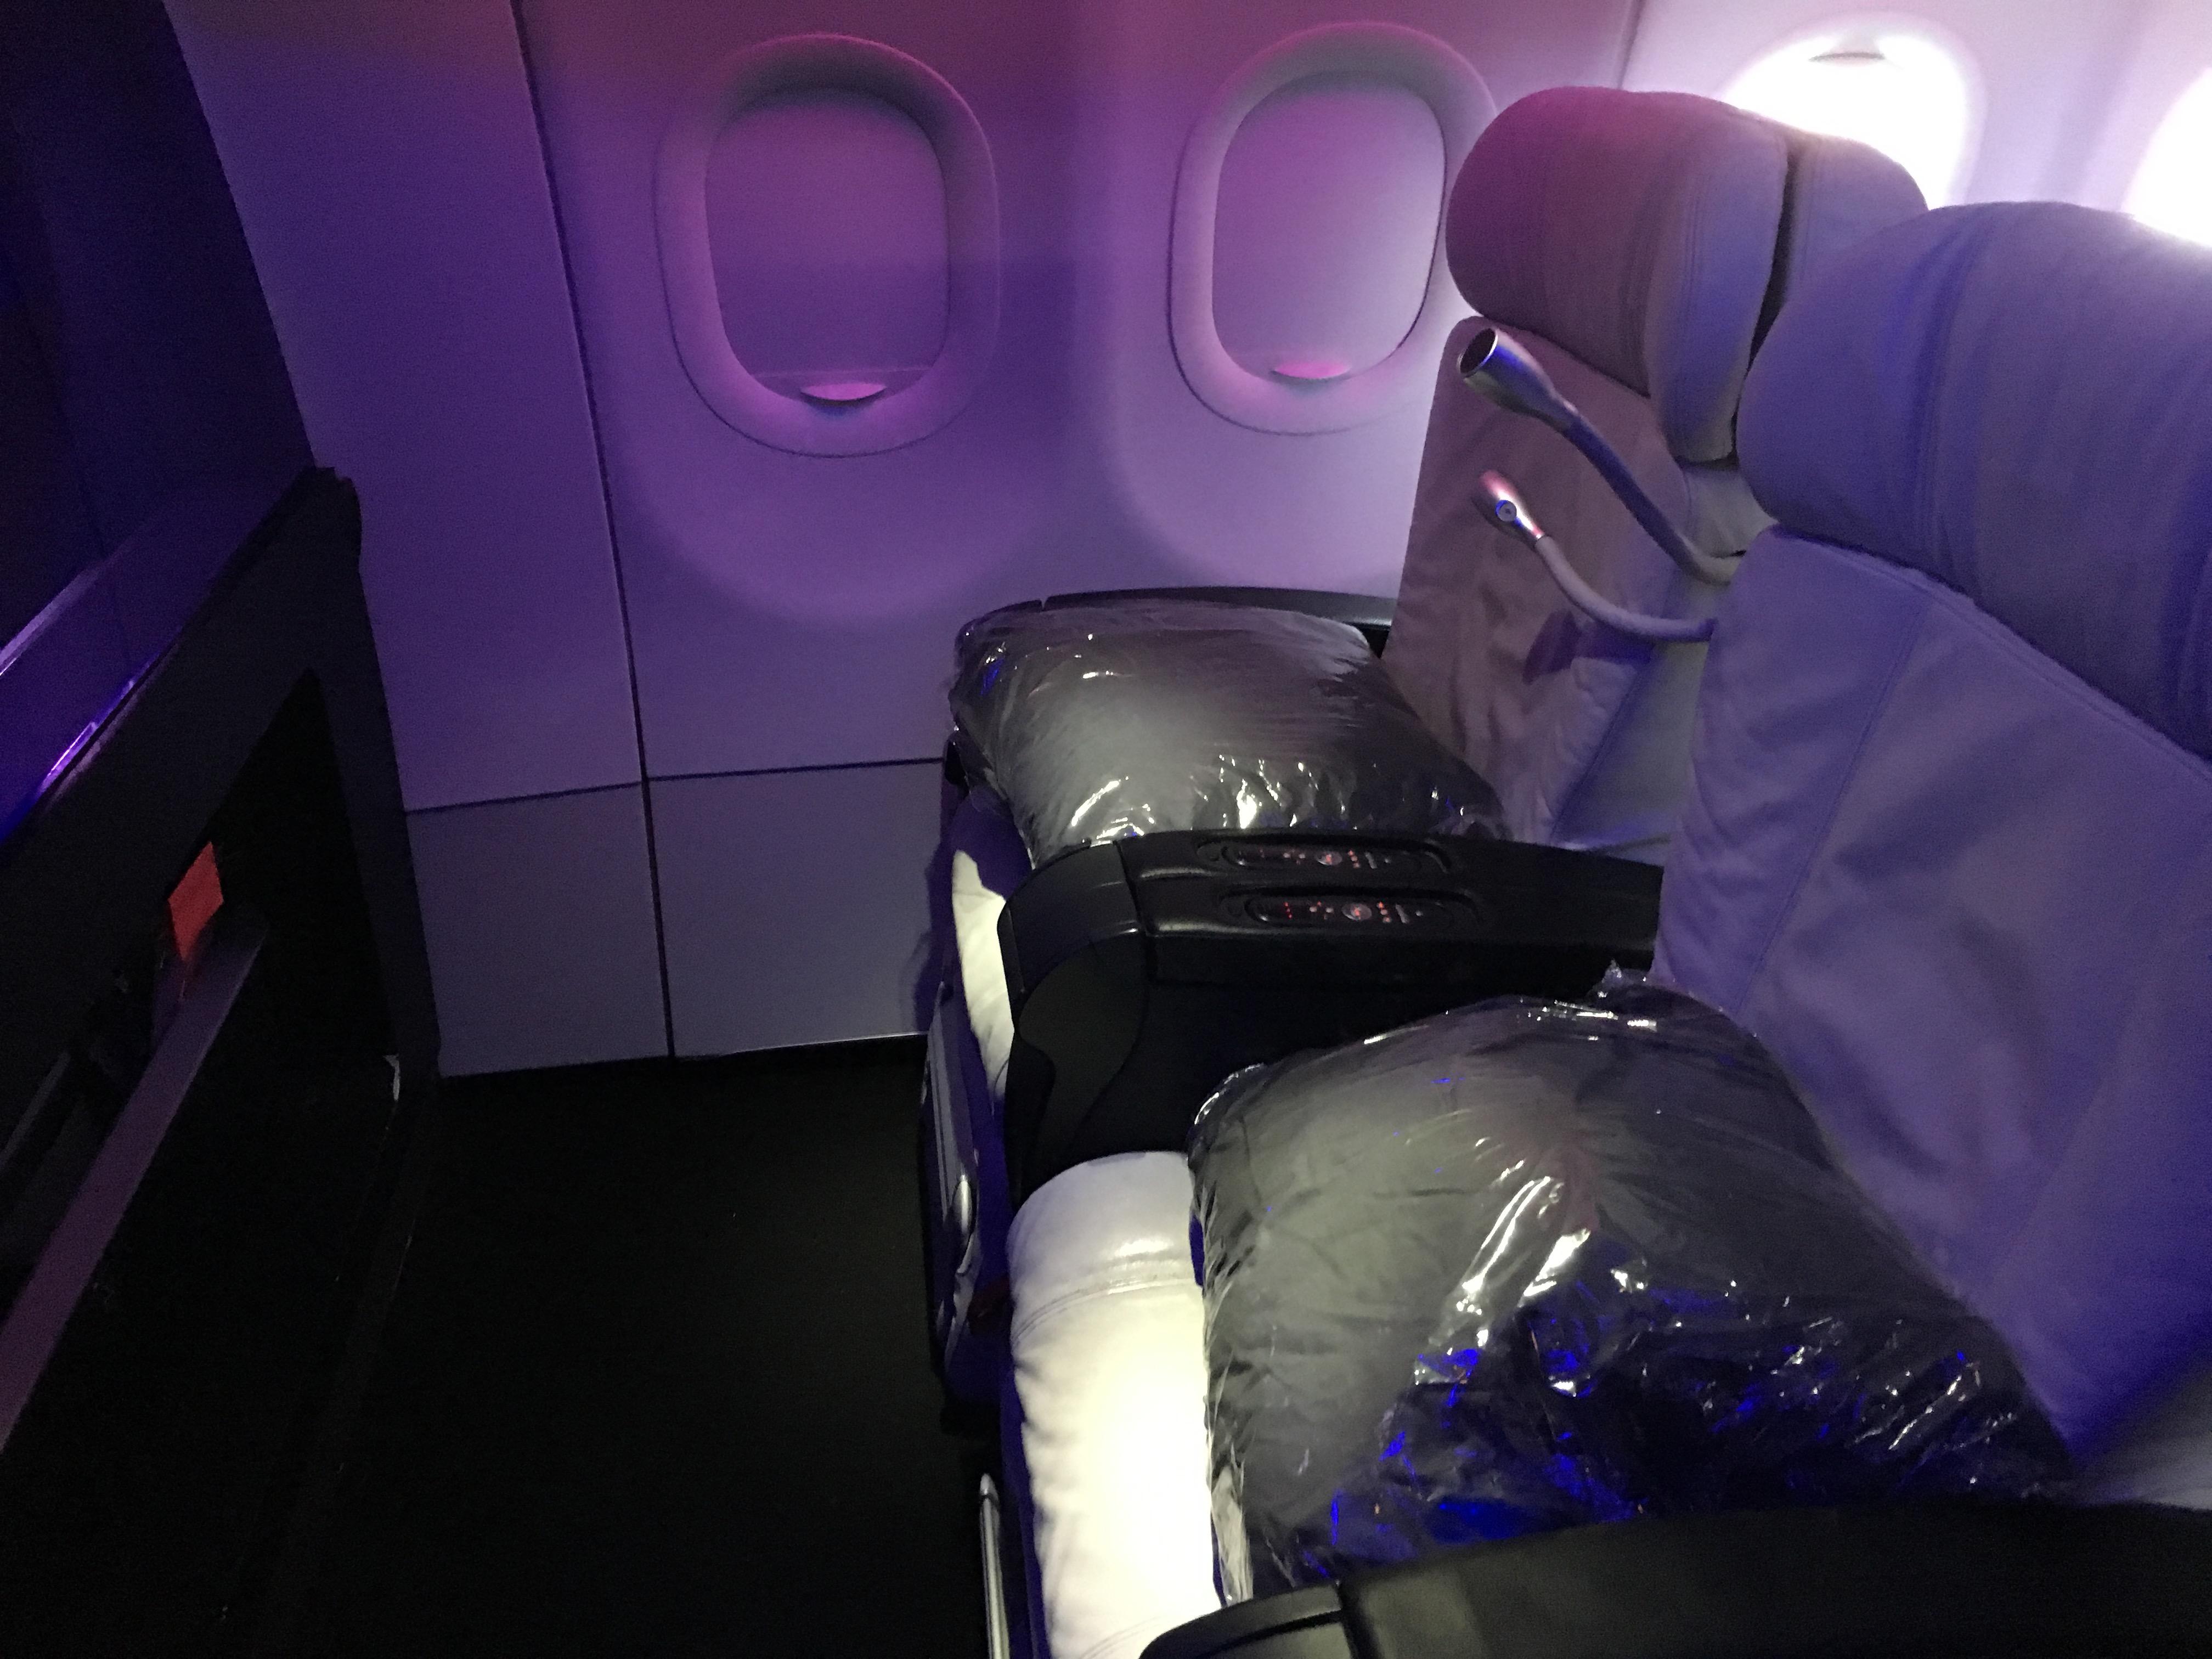 Virgin America A320 First Class Cabin